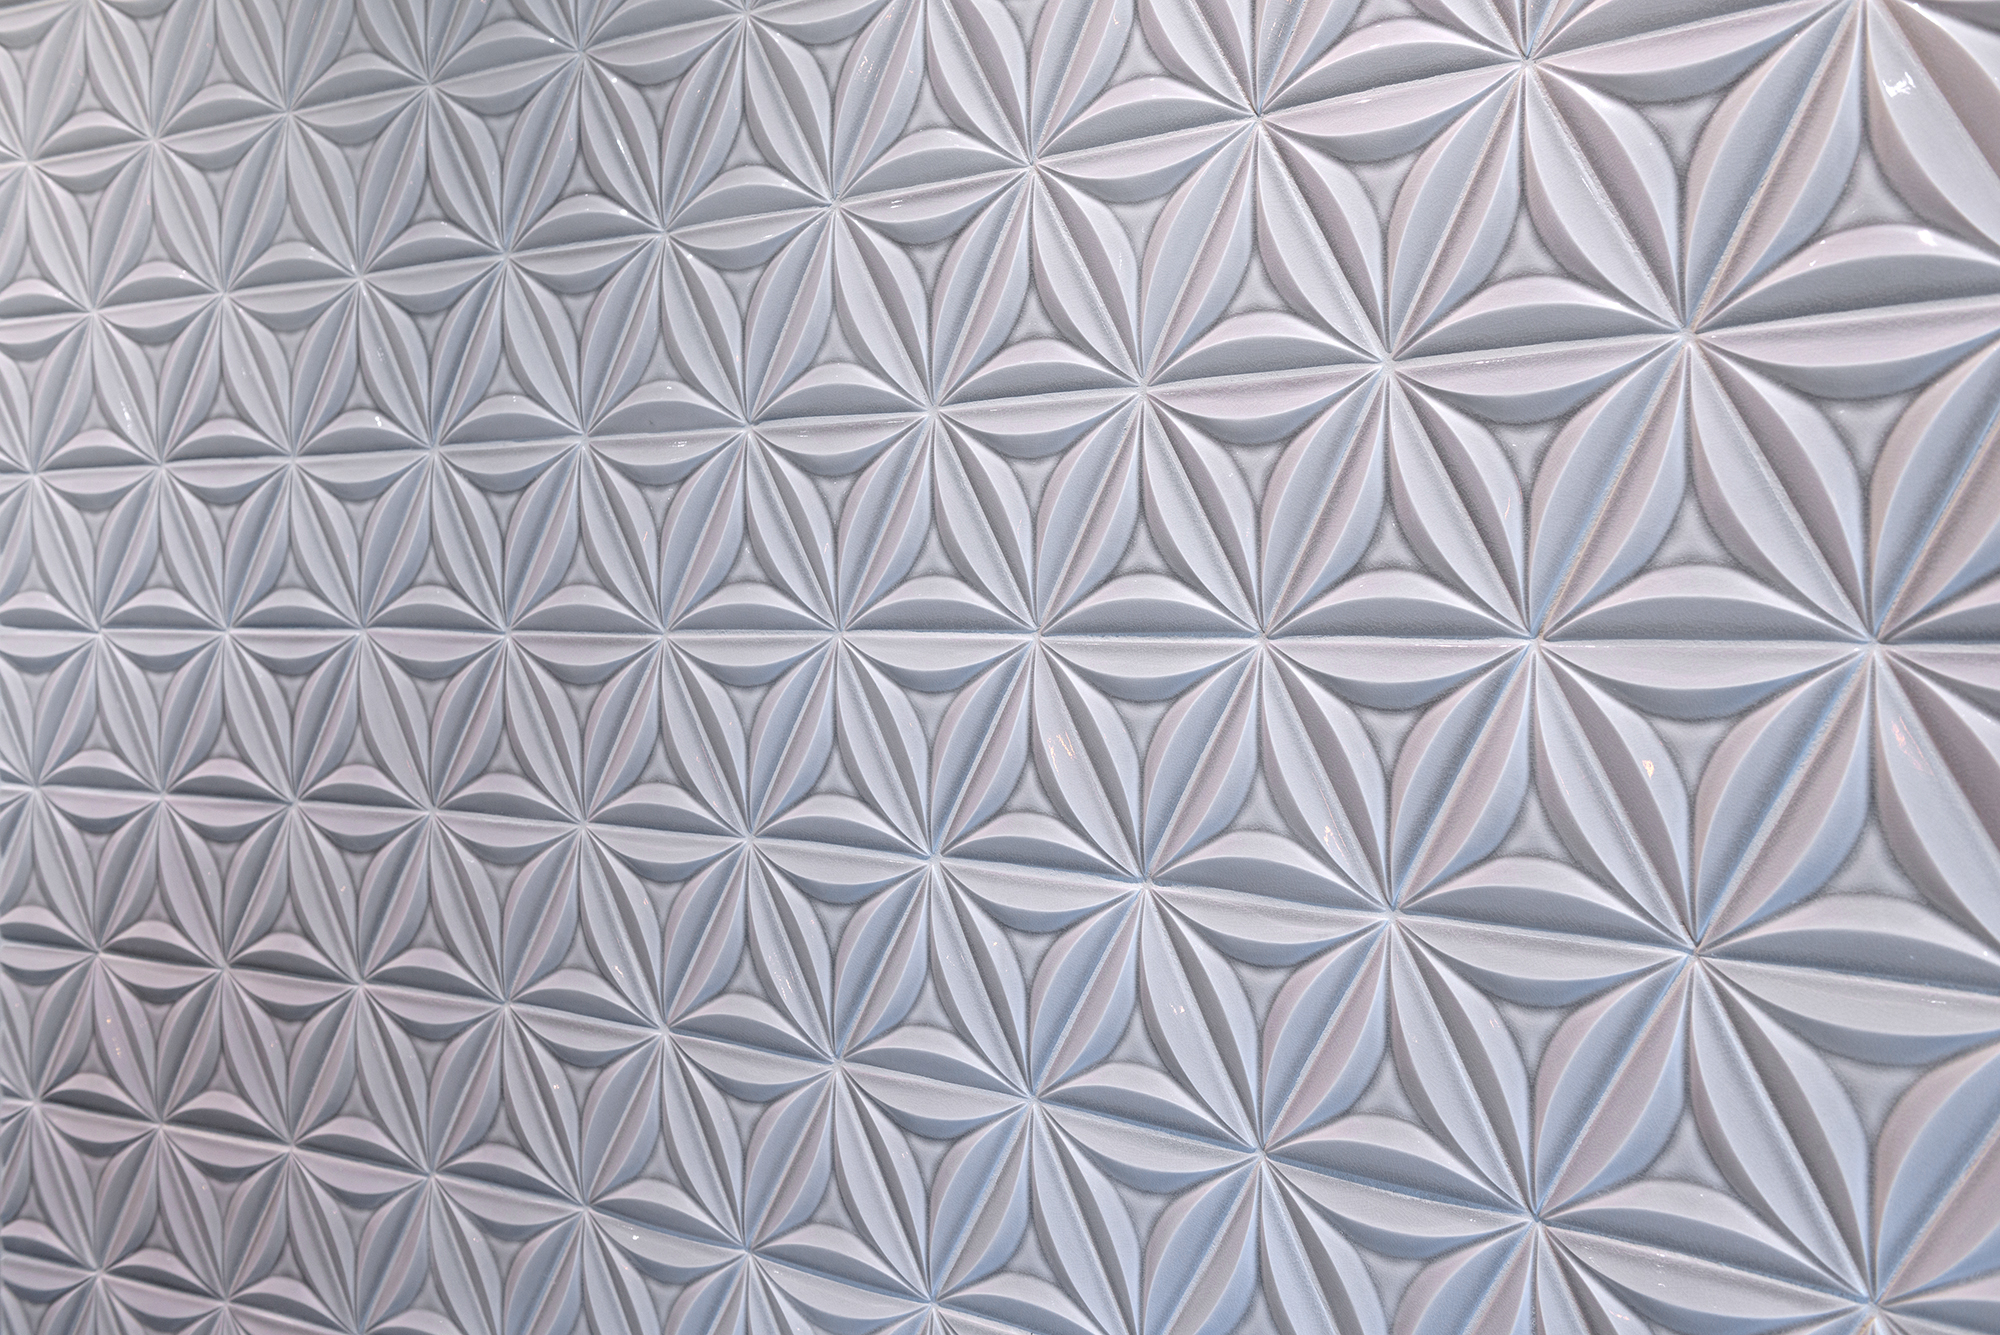 Glazed Finish Sonoma Tilemakers Stellar Marea